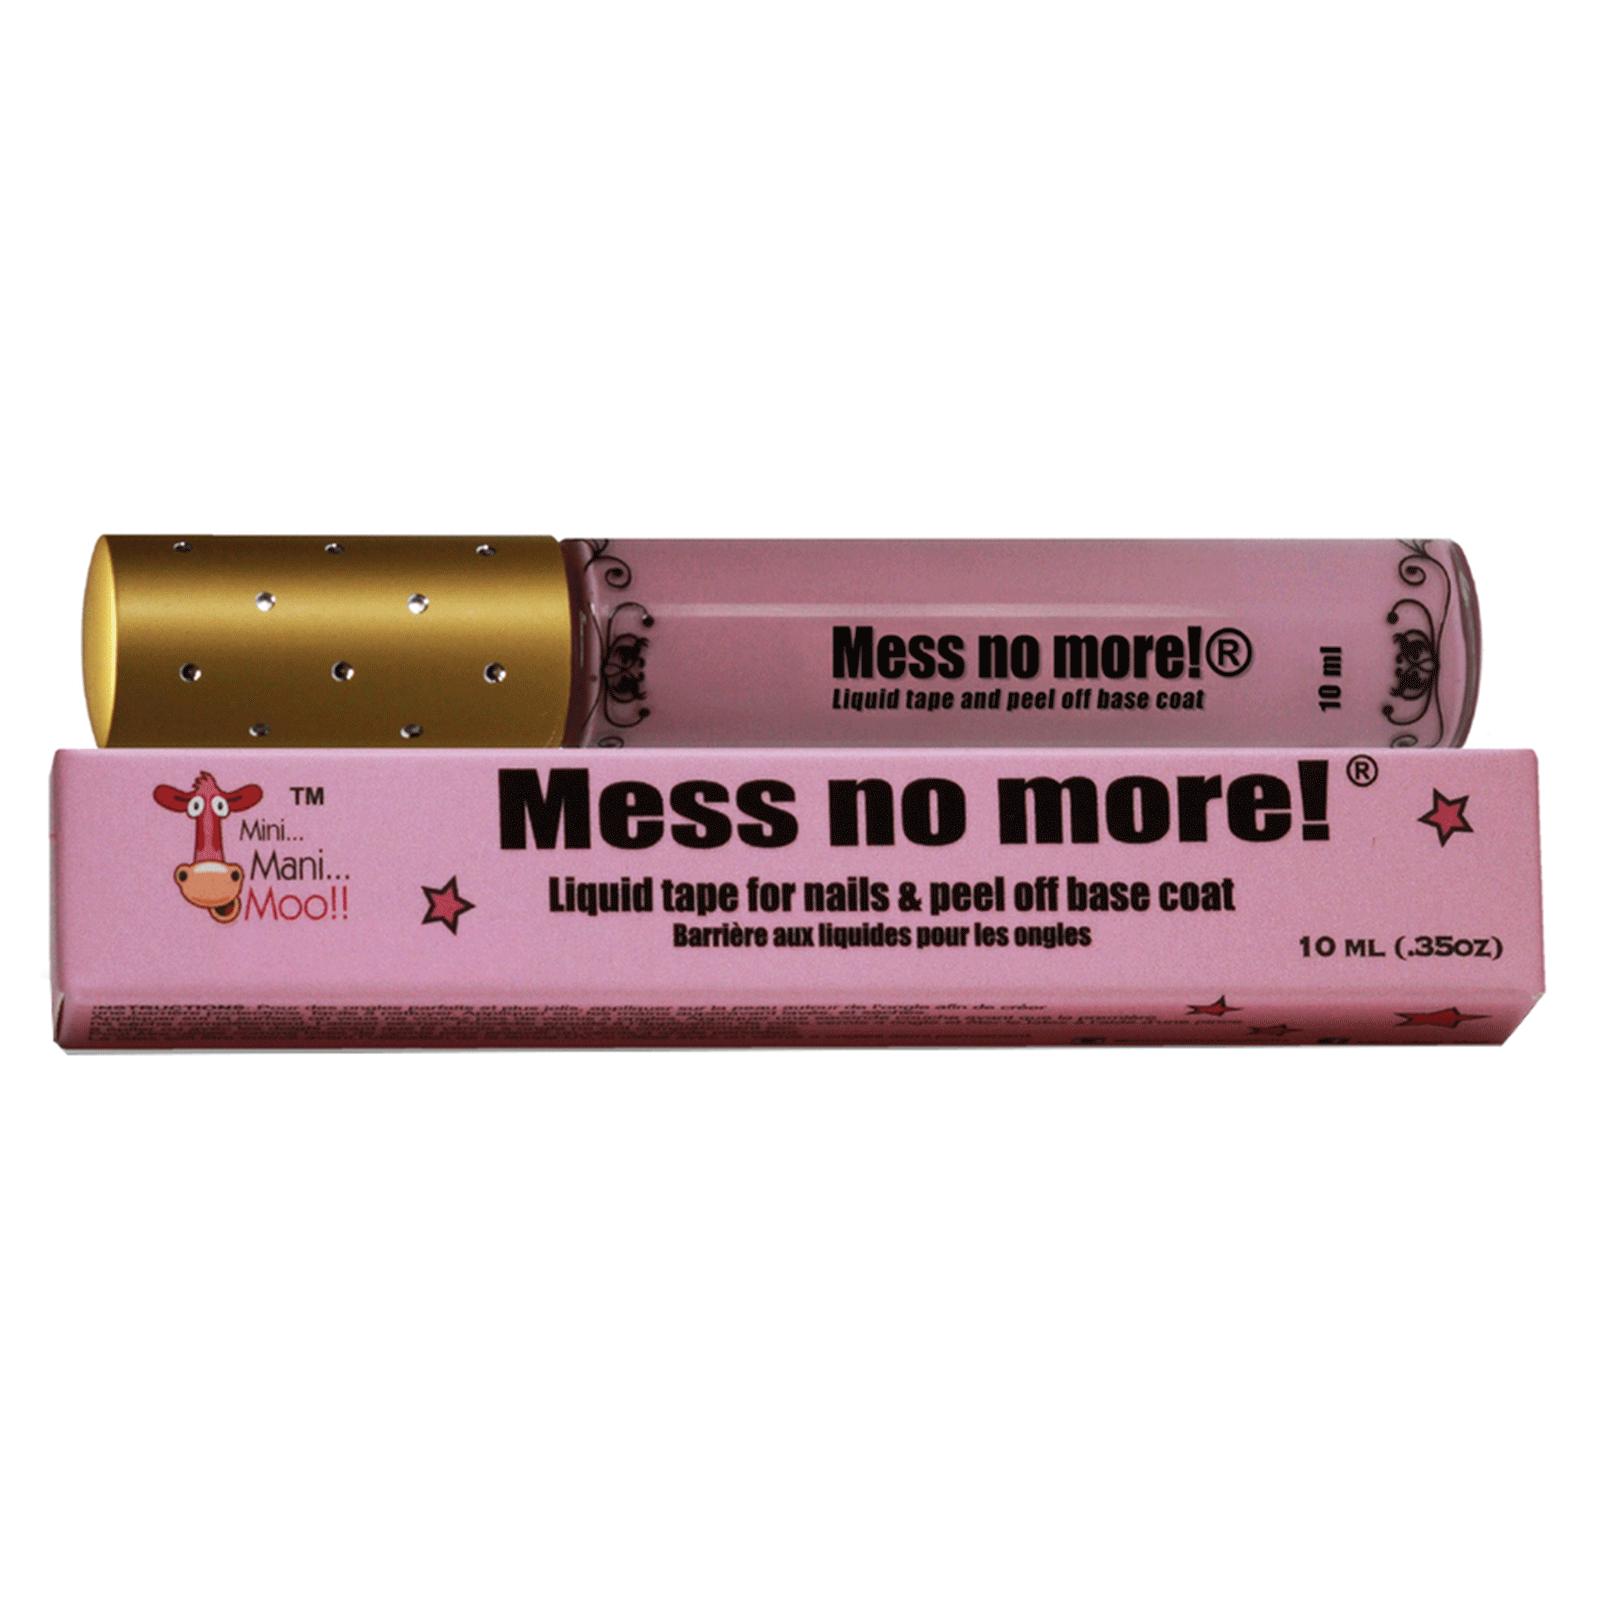 Mess No More® Liquid Tape - Mini Mani Moo | CosmoProf